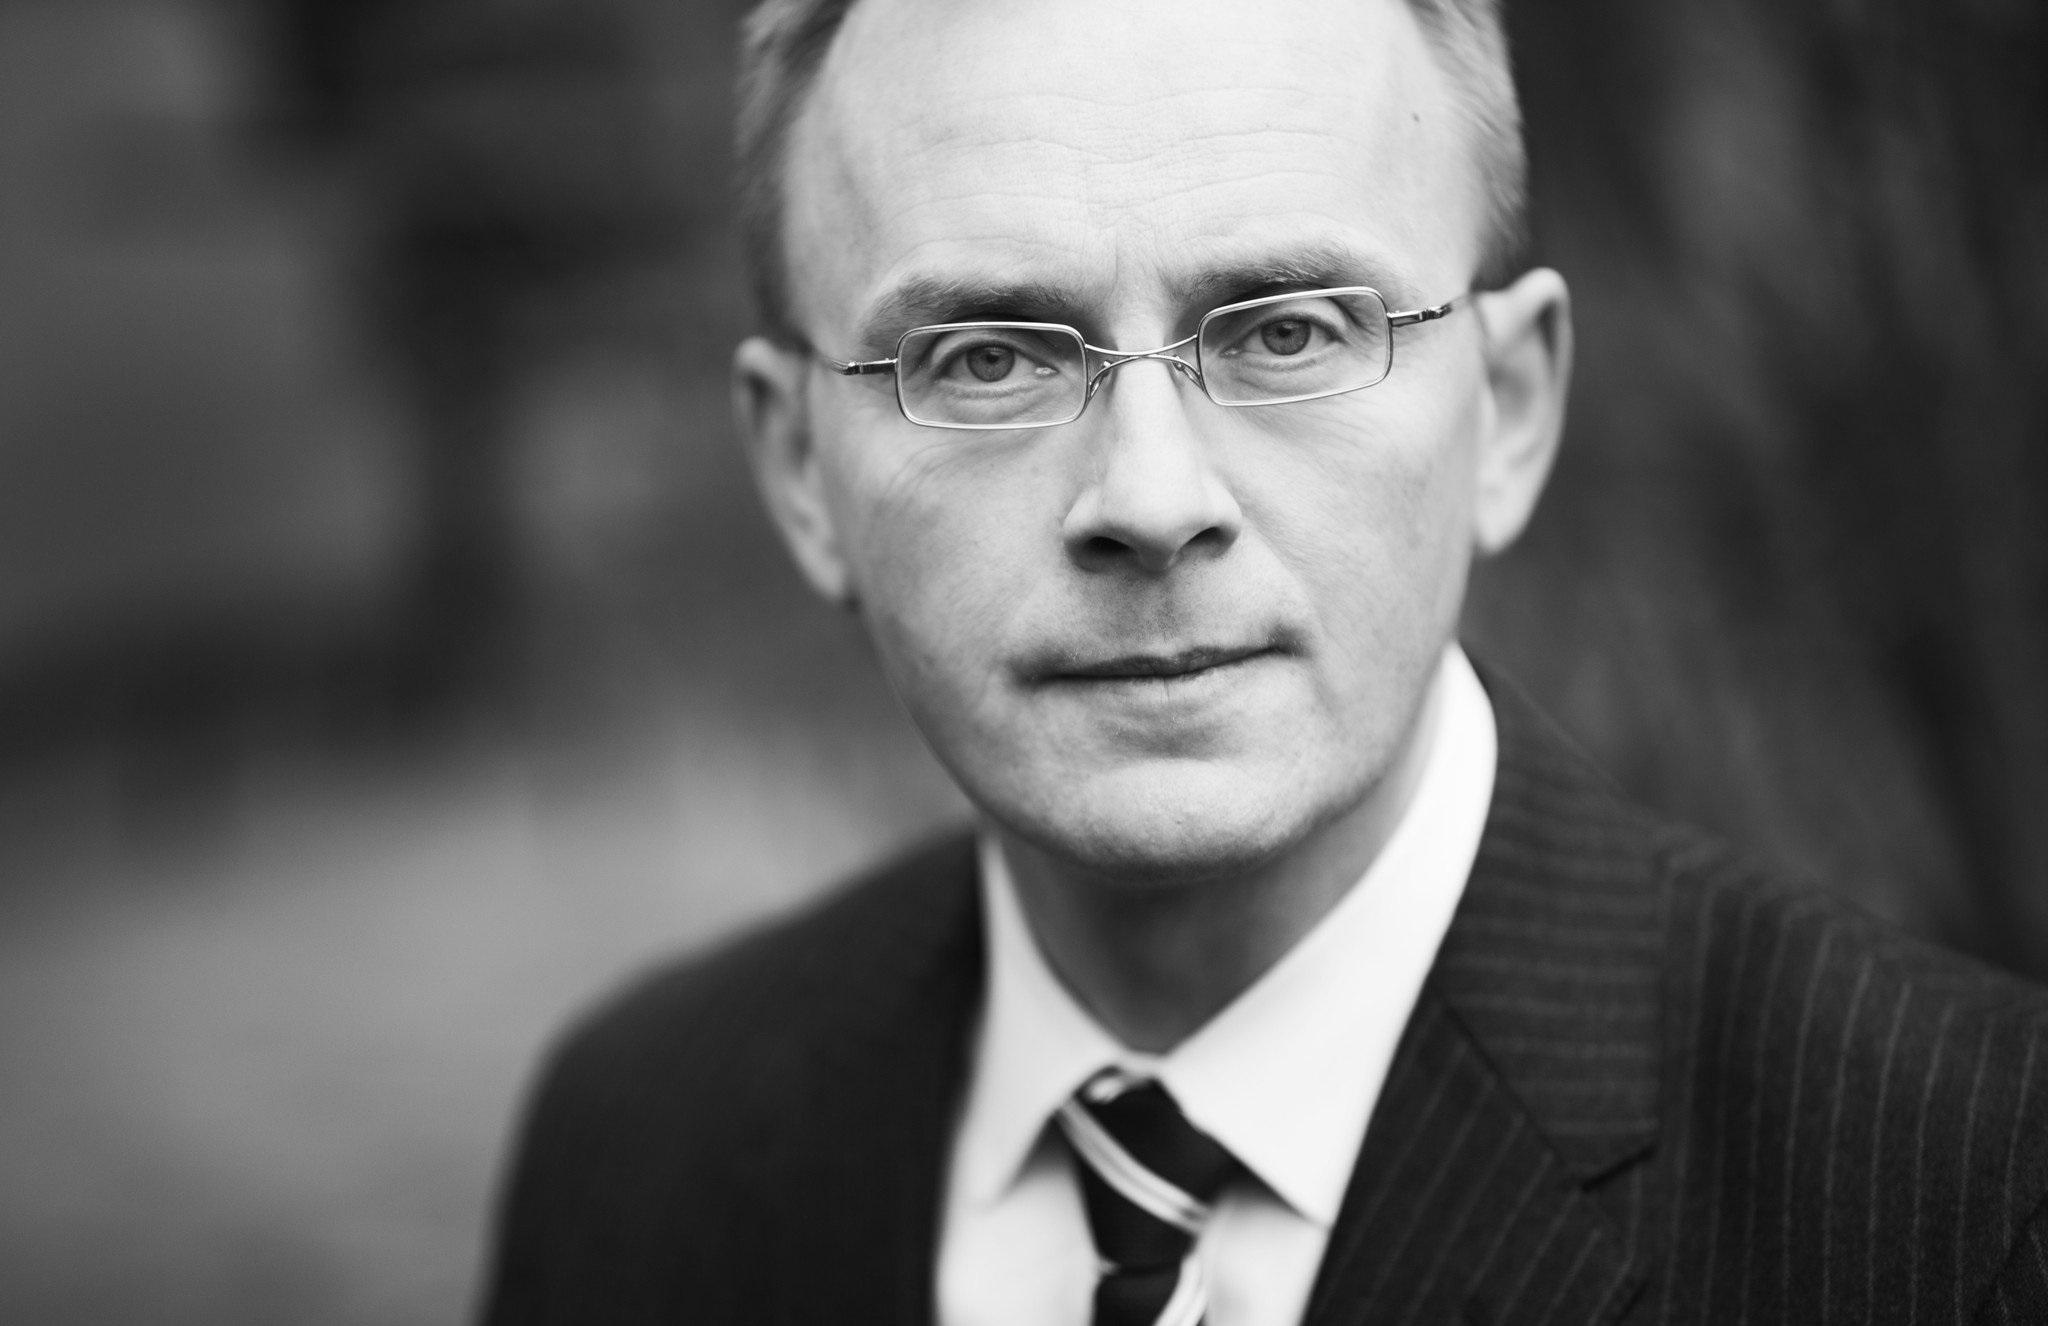 Soberg_Morten_Pernille_Blafjell_Walvik_2017_2 (1)